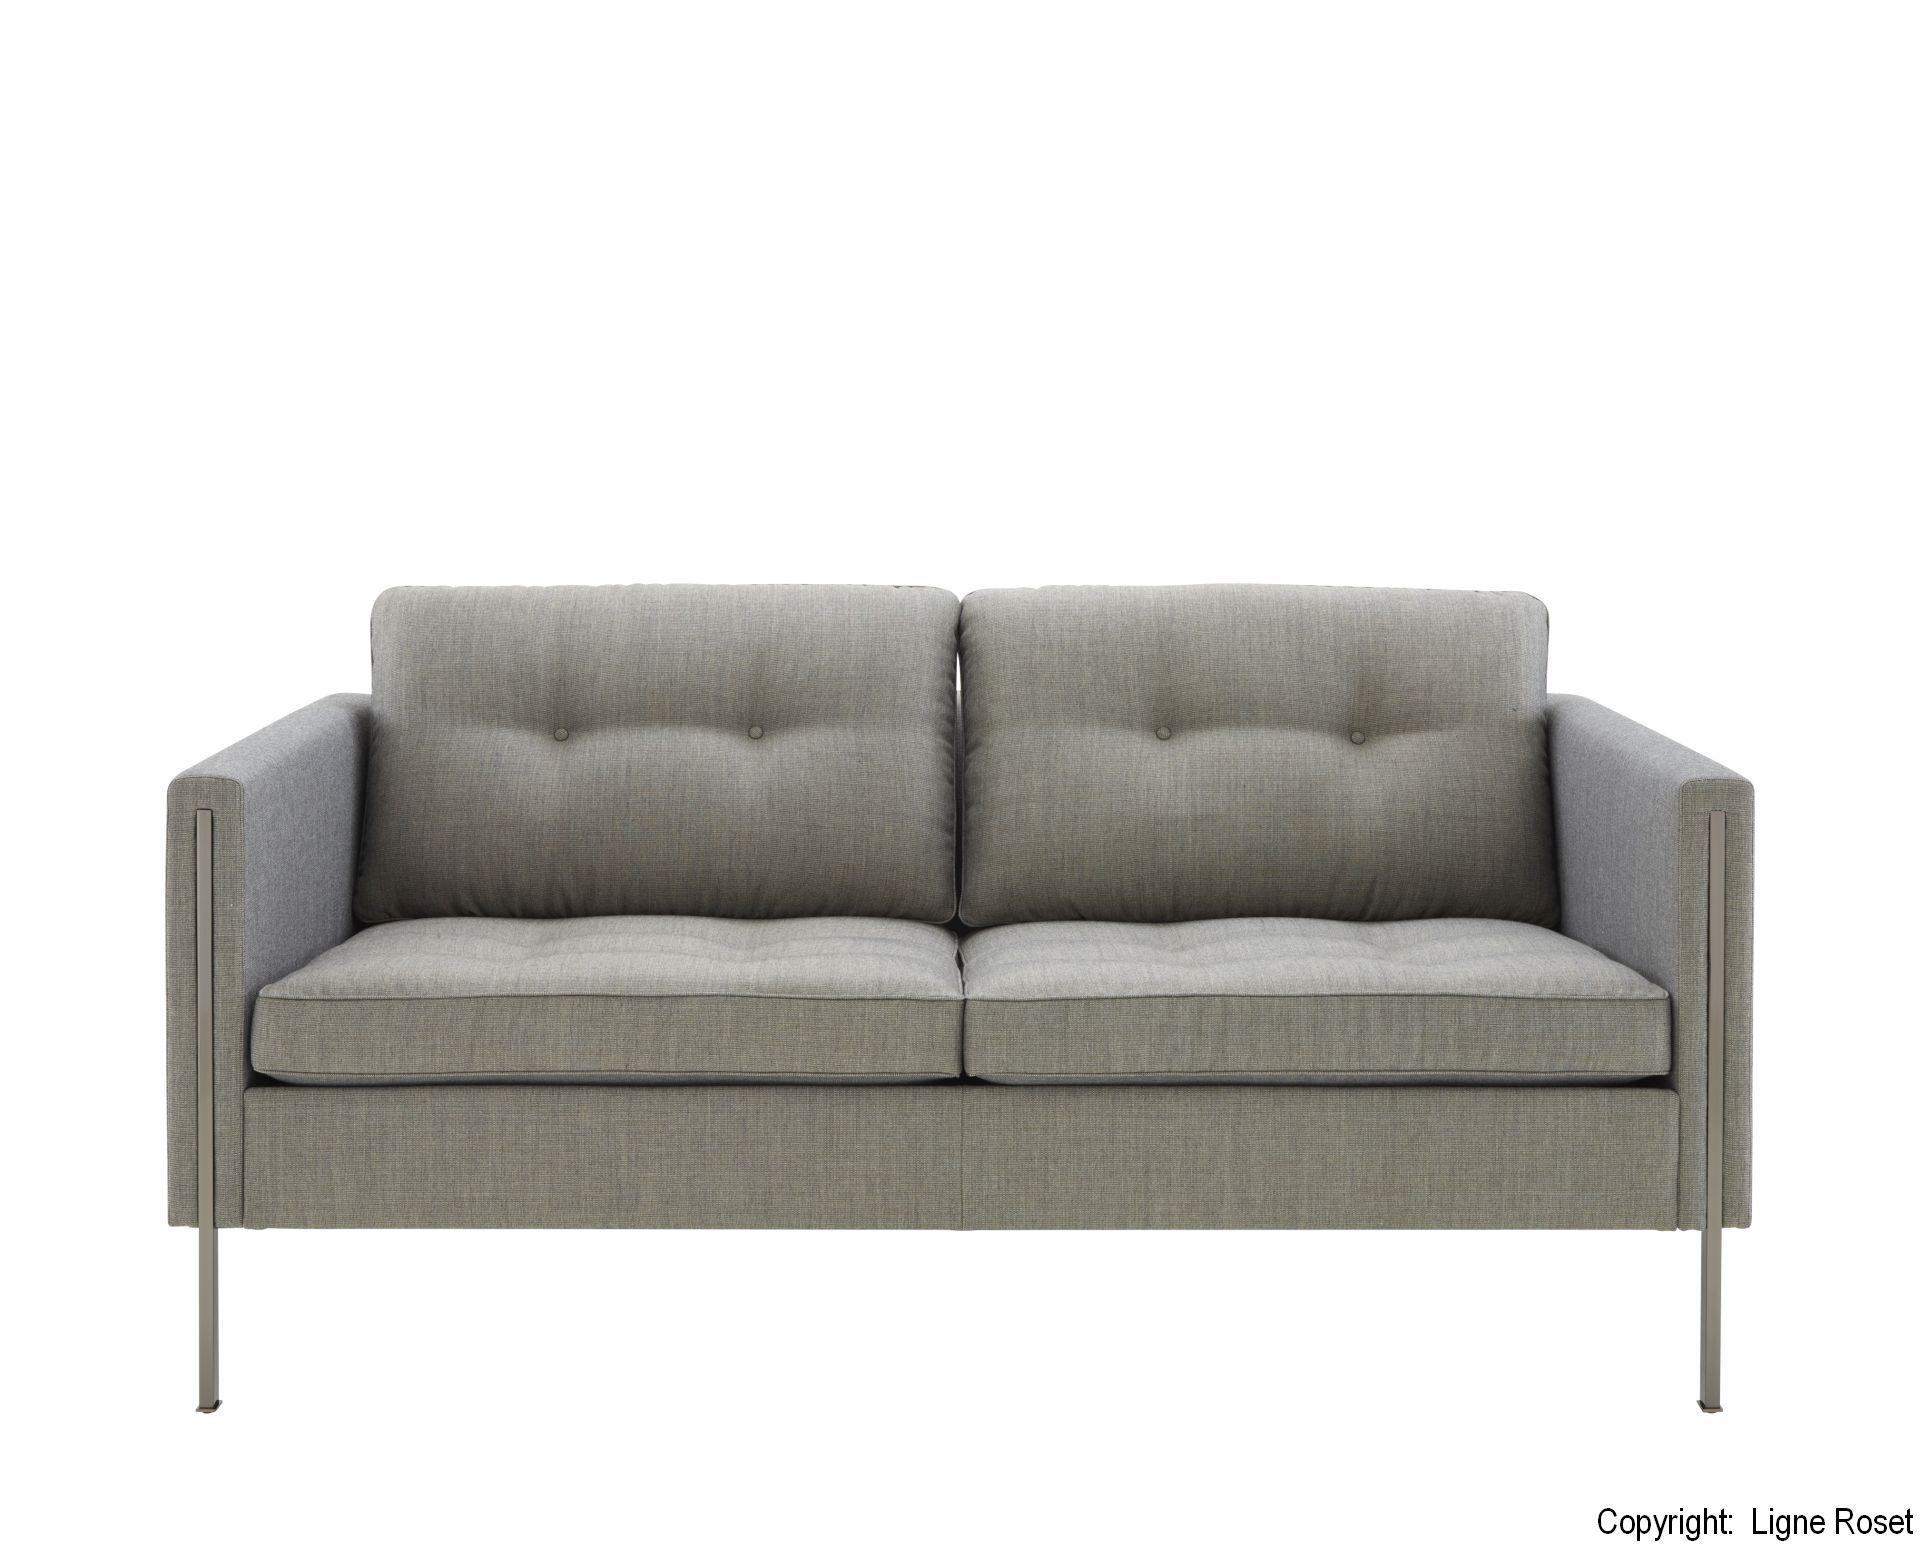 Full Size of Graues Sofa Welche Kissen Alternatives Breit Polyrattan Grau Leder Kunstleder Xora Ektorp Big Kolonialstil Blaues Sofa Graues Sofa